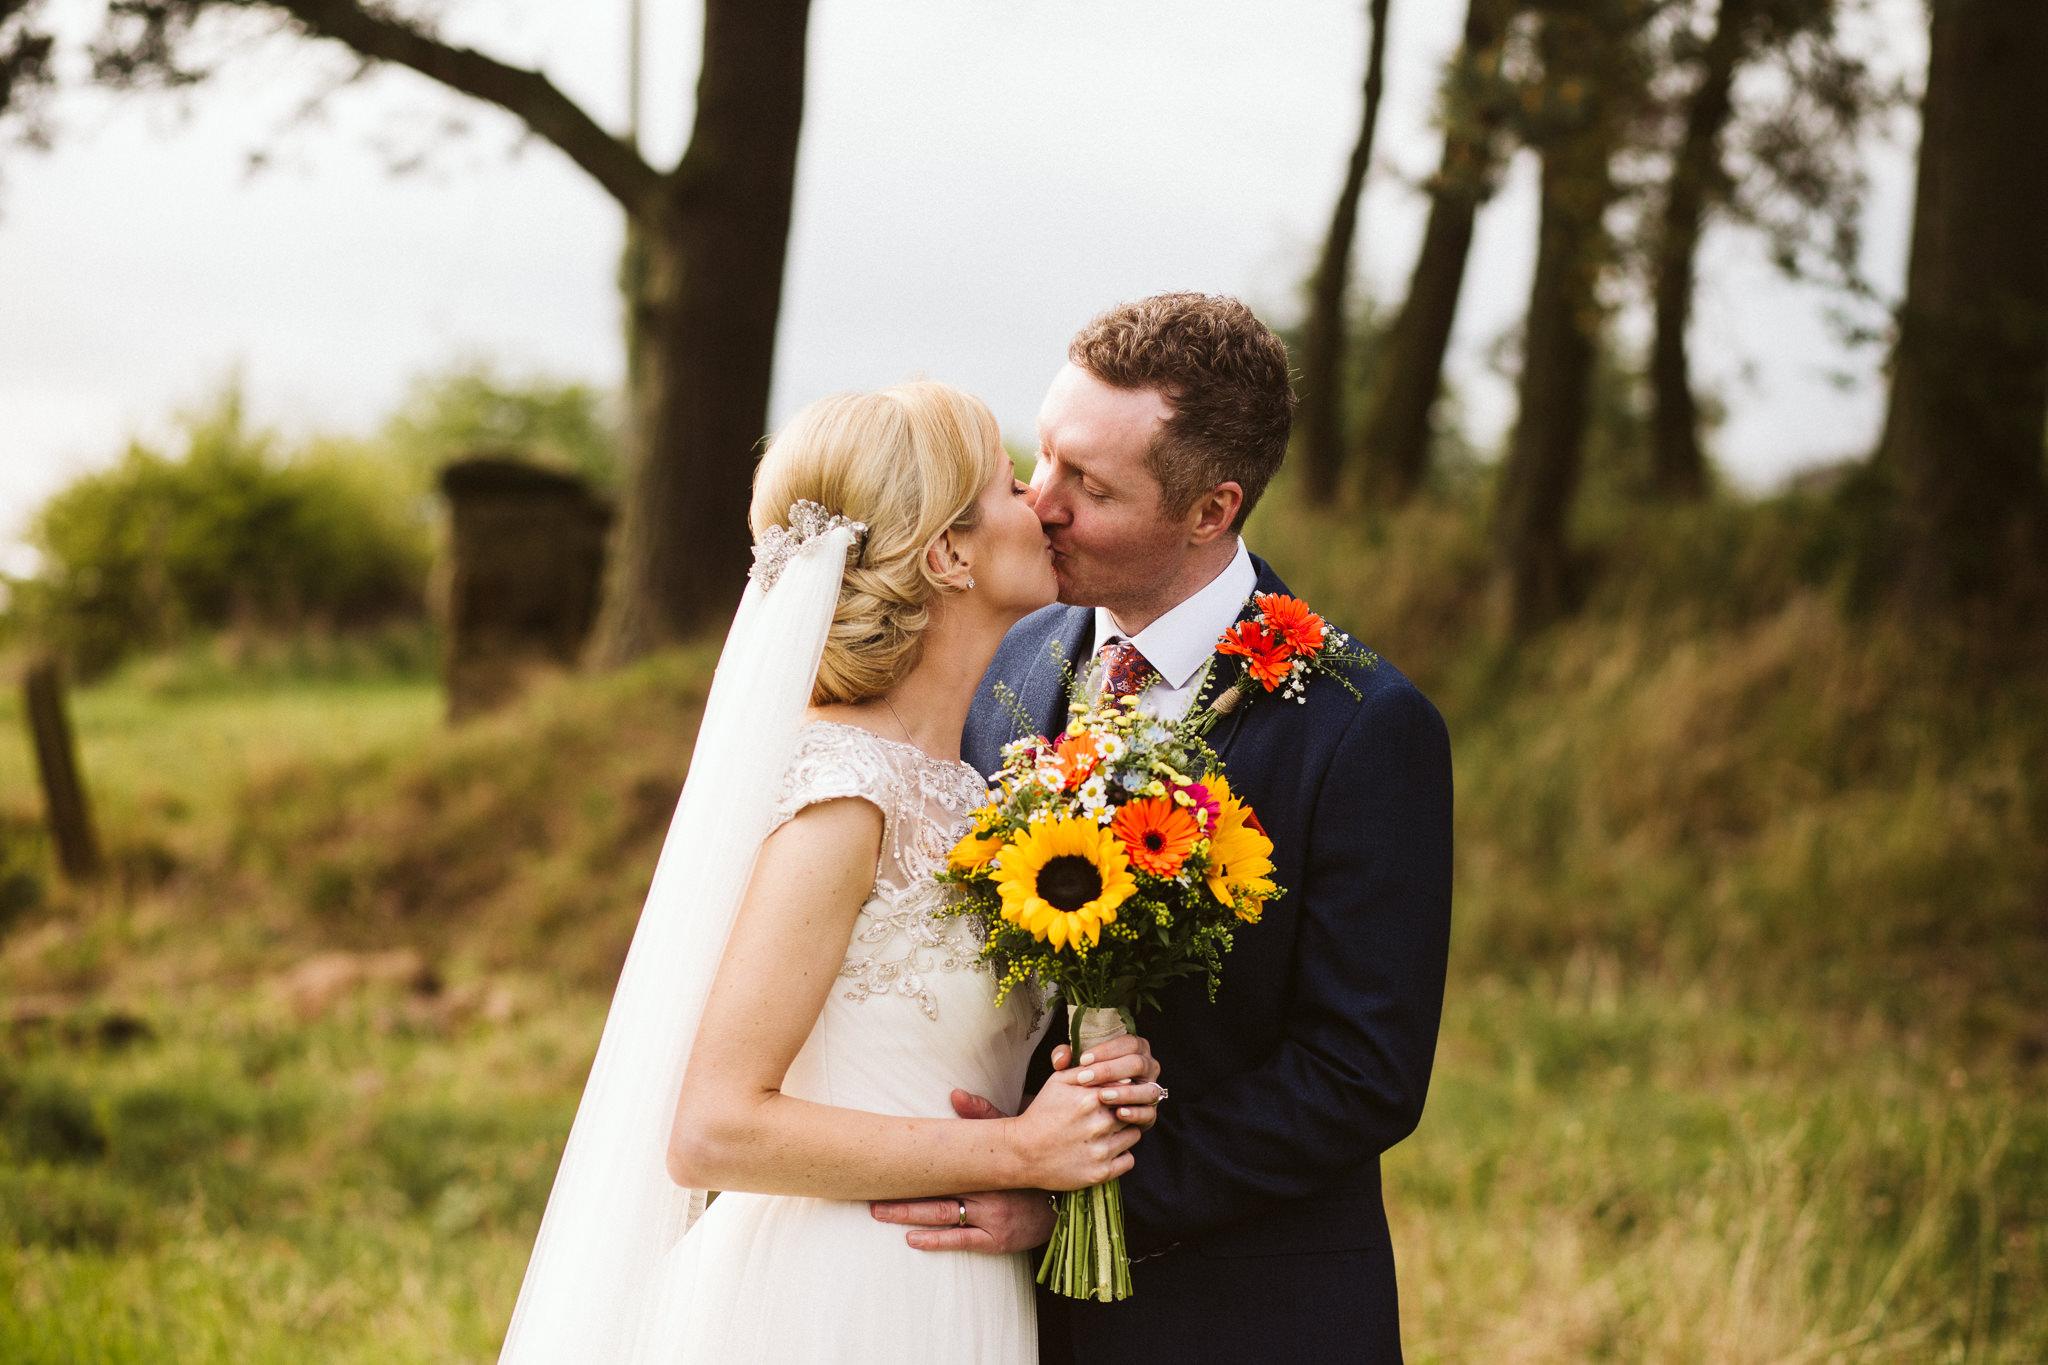 northside-farm-wedding-northumberland-margarita-hope (79).jpg